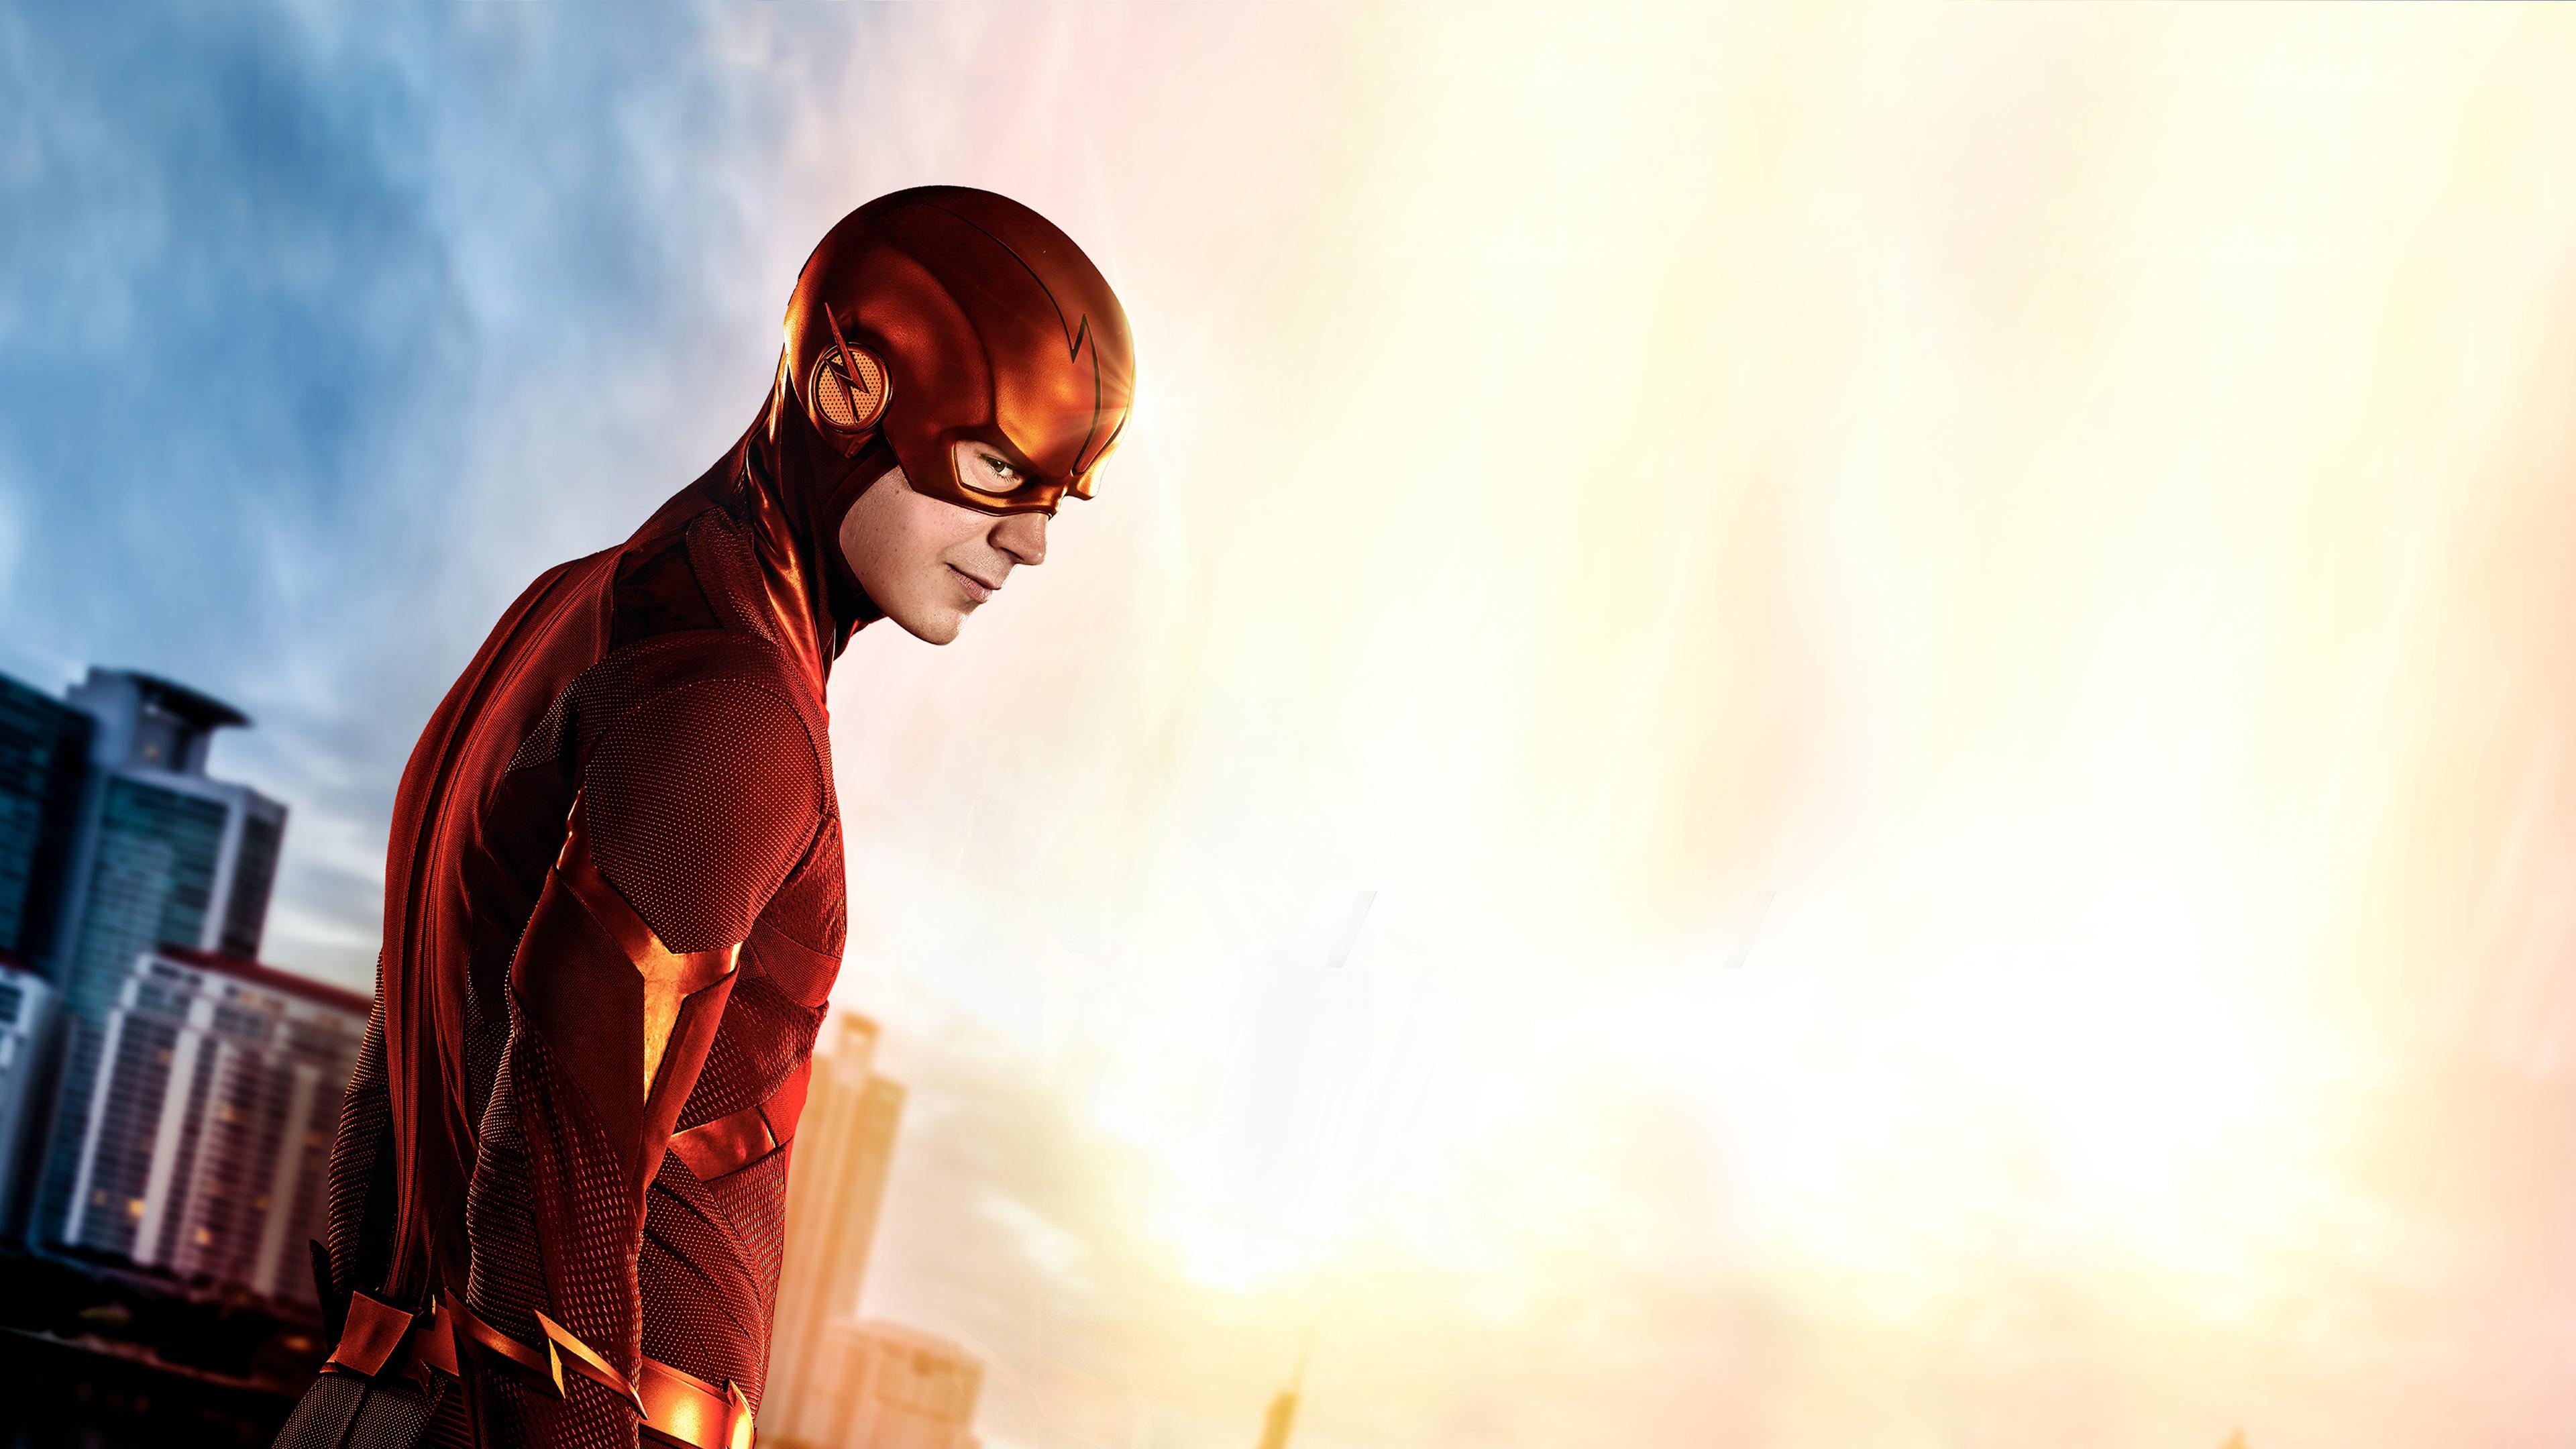 flash season 6 1578253090 - Flash Season 6 - Flash Season 6 4k wallpaper